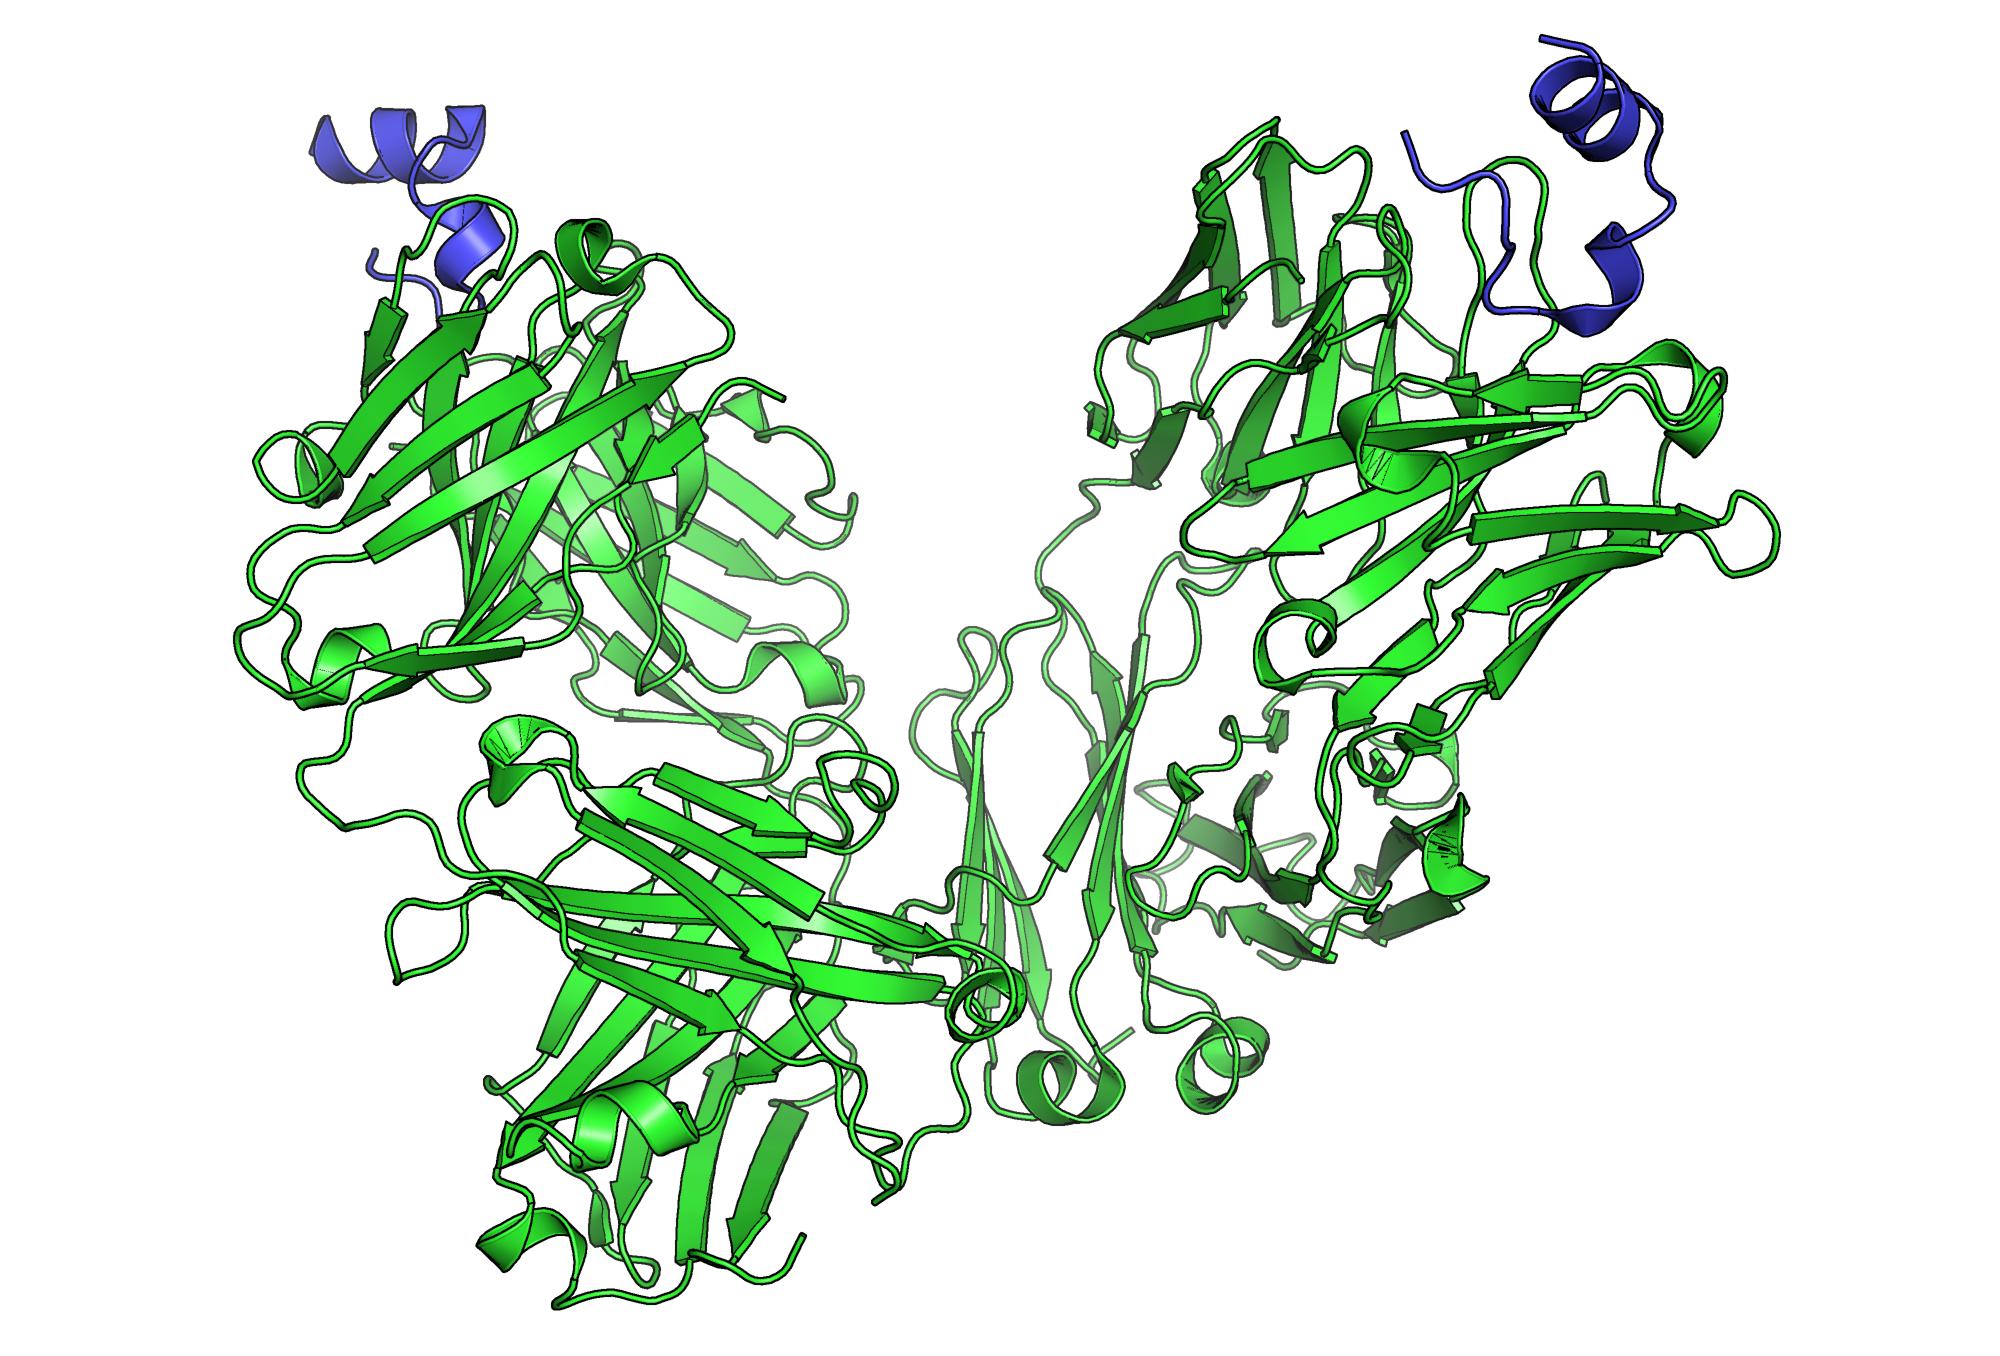 Peptide bound to Rituxima